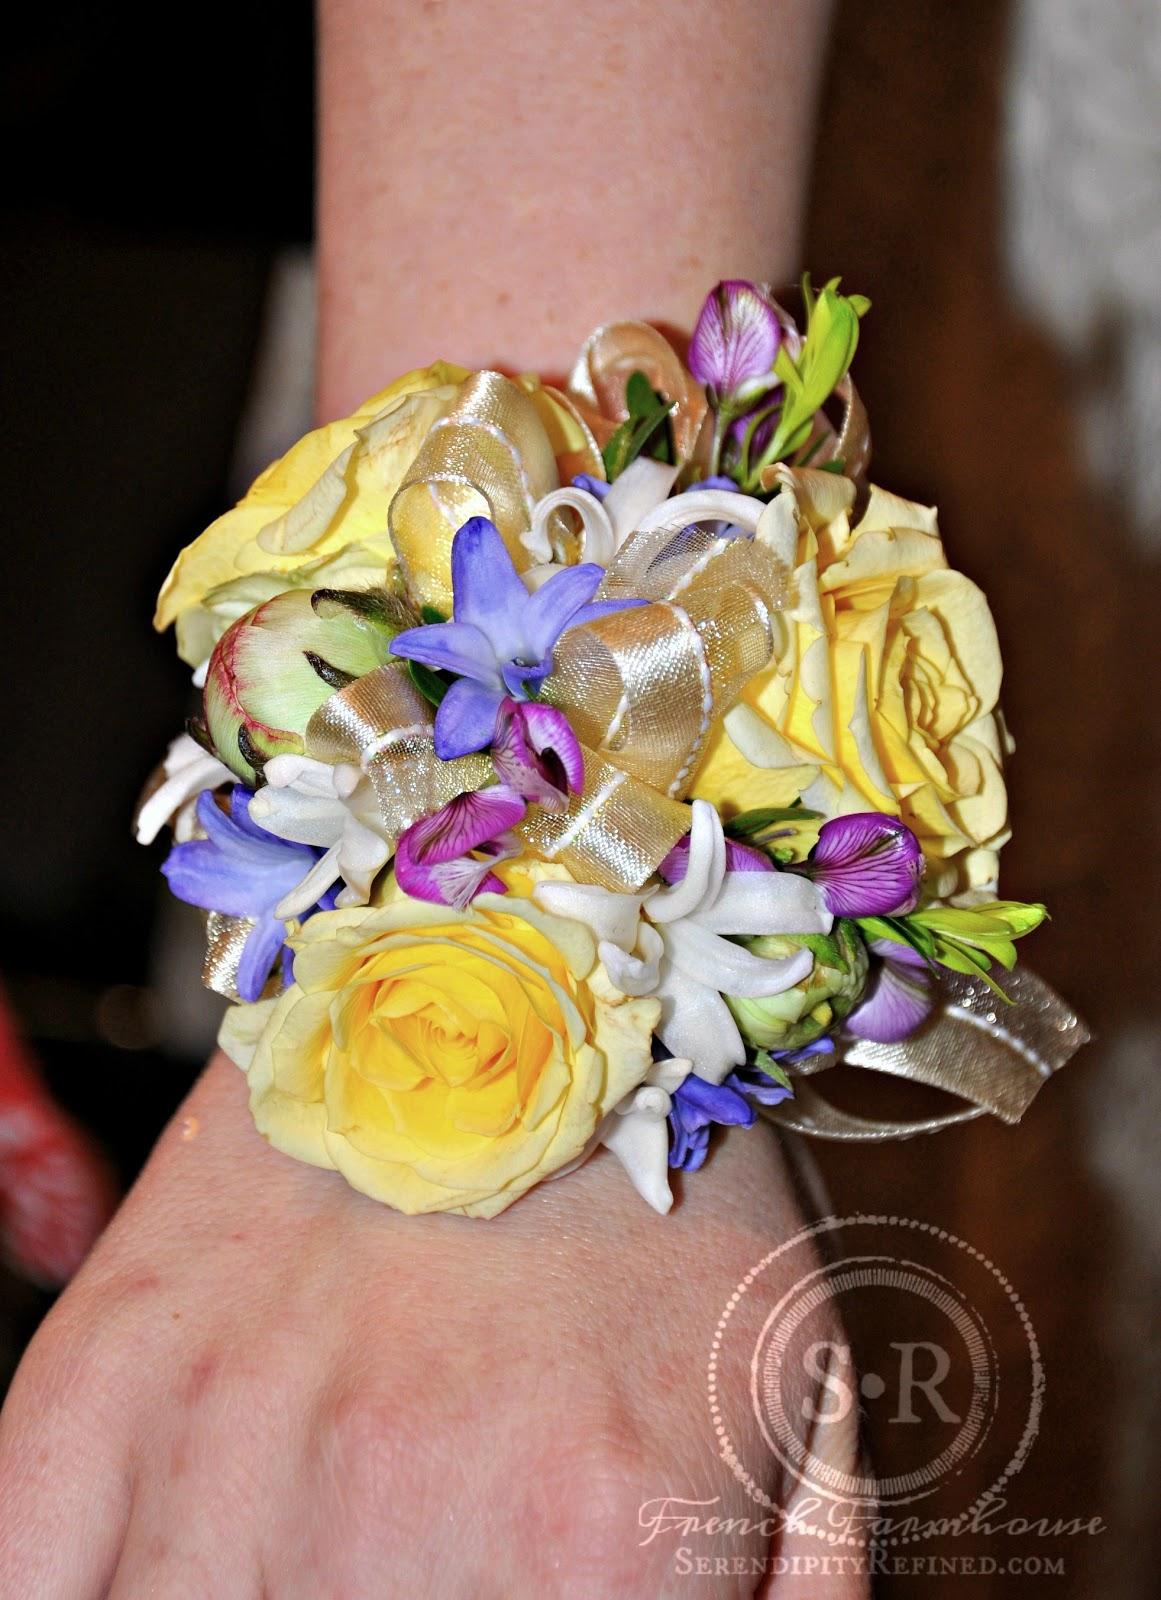 Flower Garden Themed Bridal Shower : Serendipity refined spring garden themed bridal shower